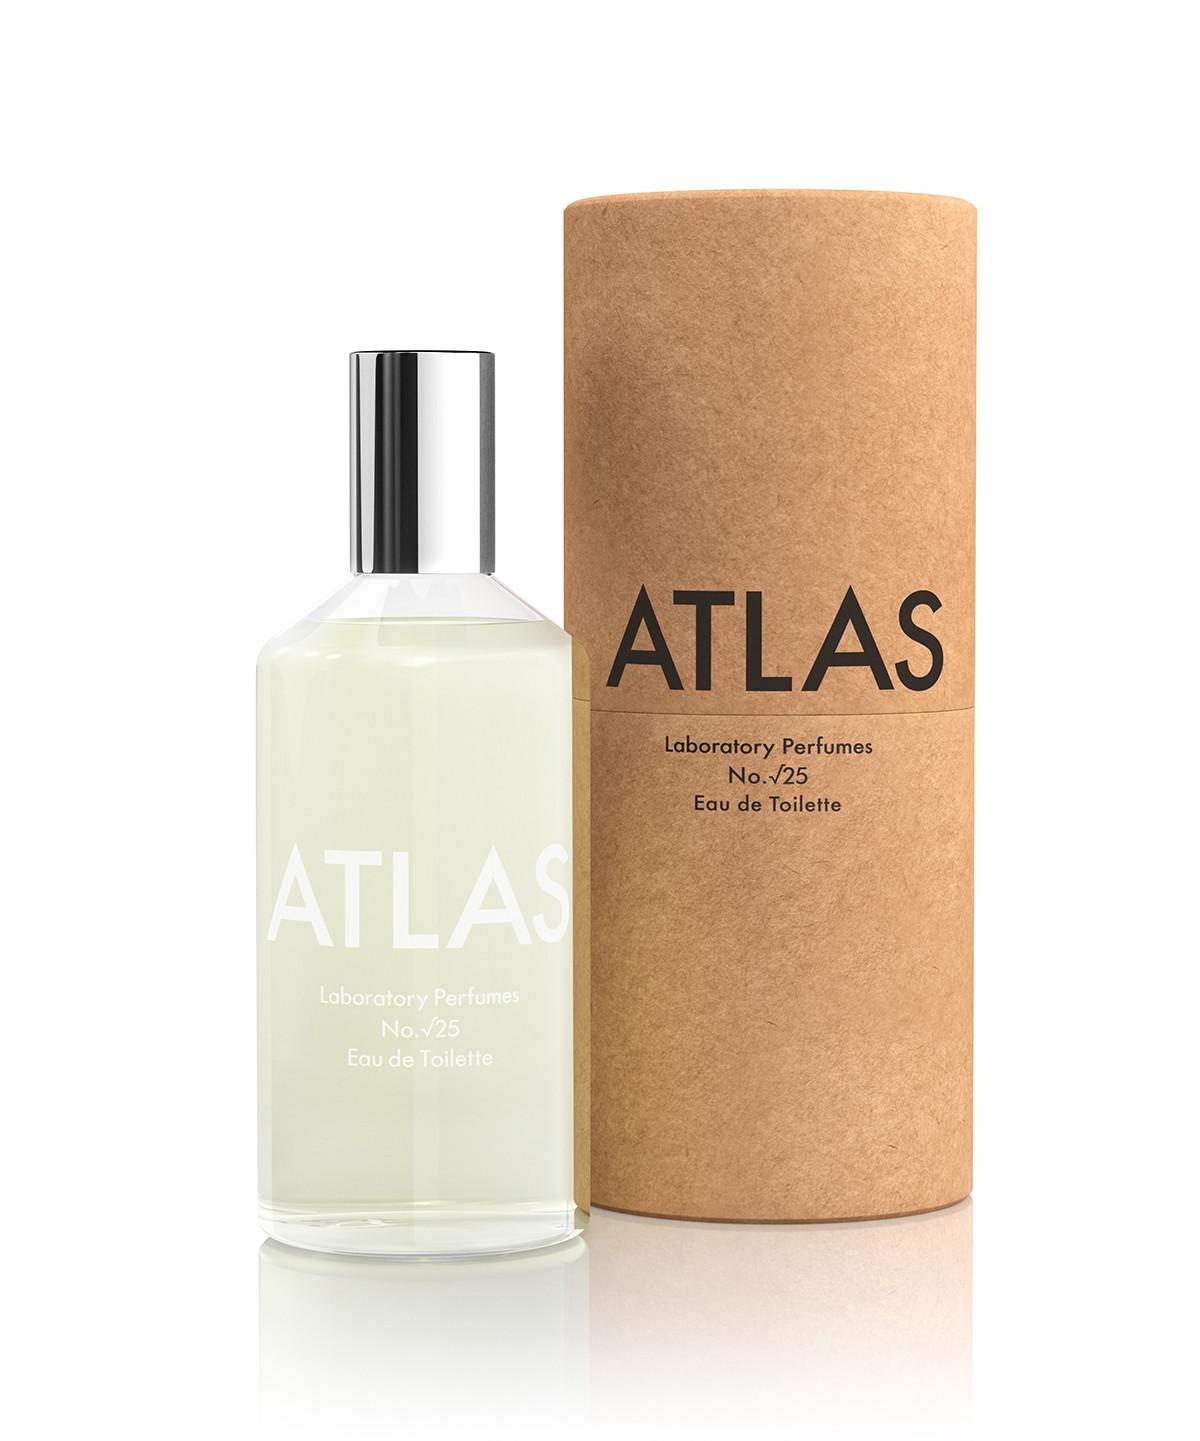 unisex-fragrances-perfumes-02